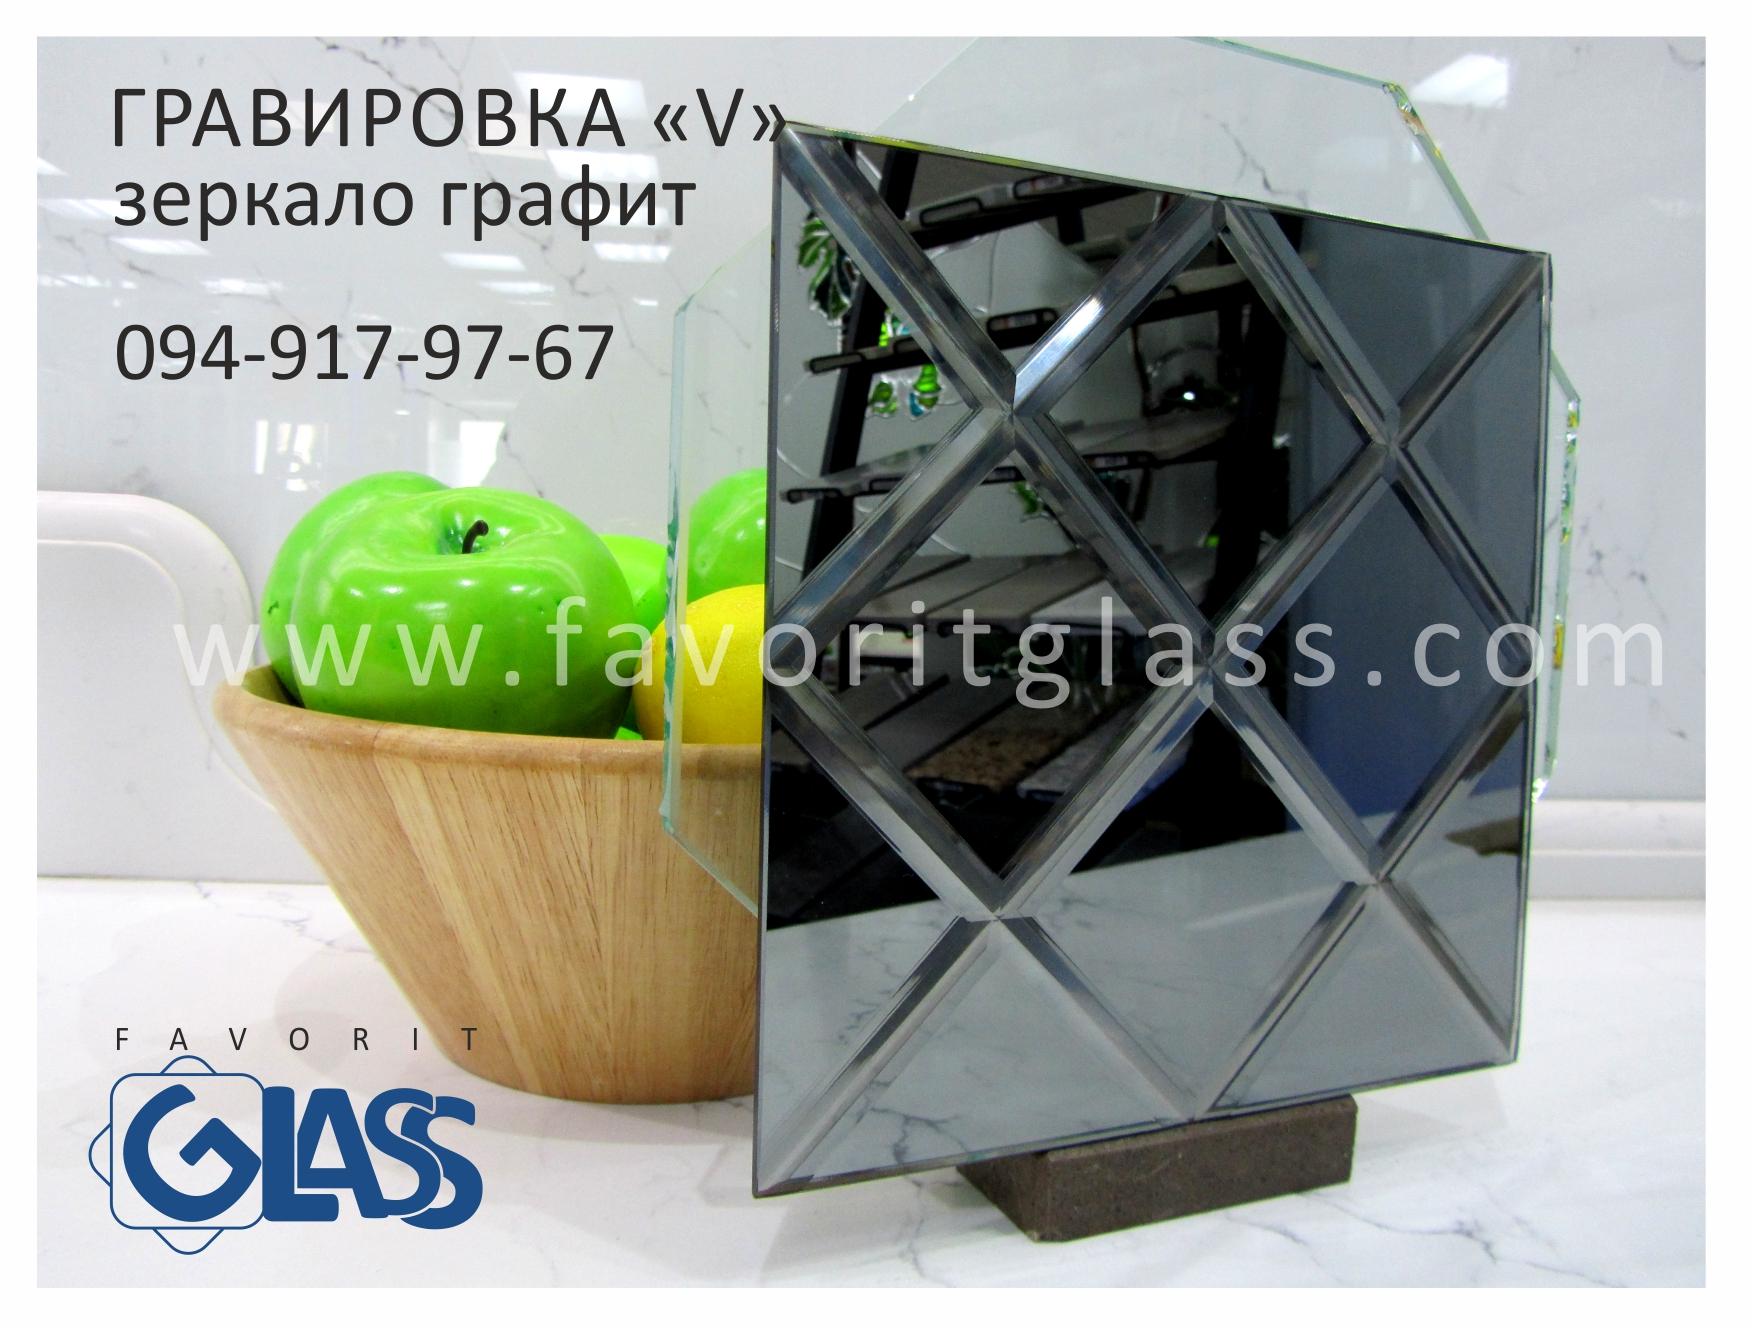 Алмазная Гравировка V на зеркале графит.